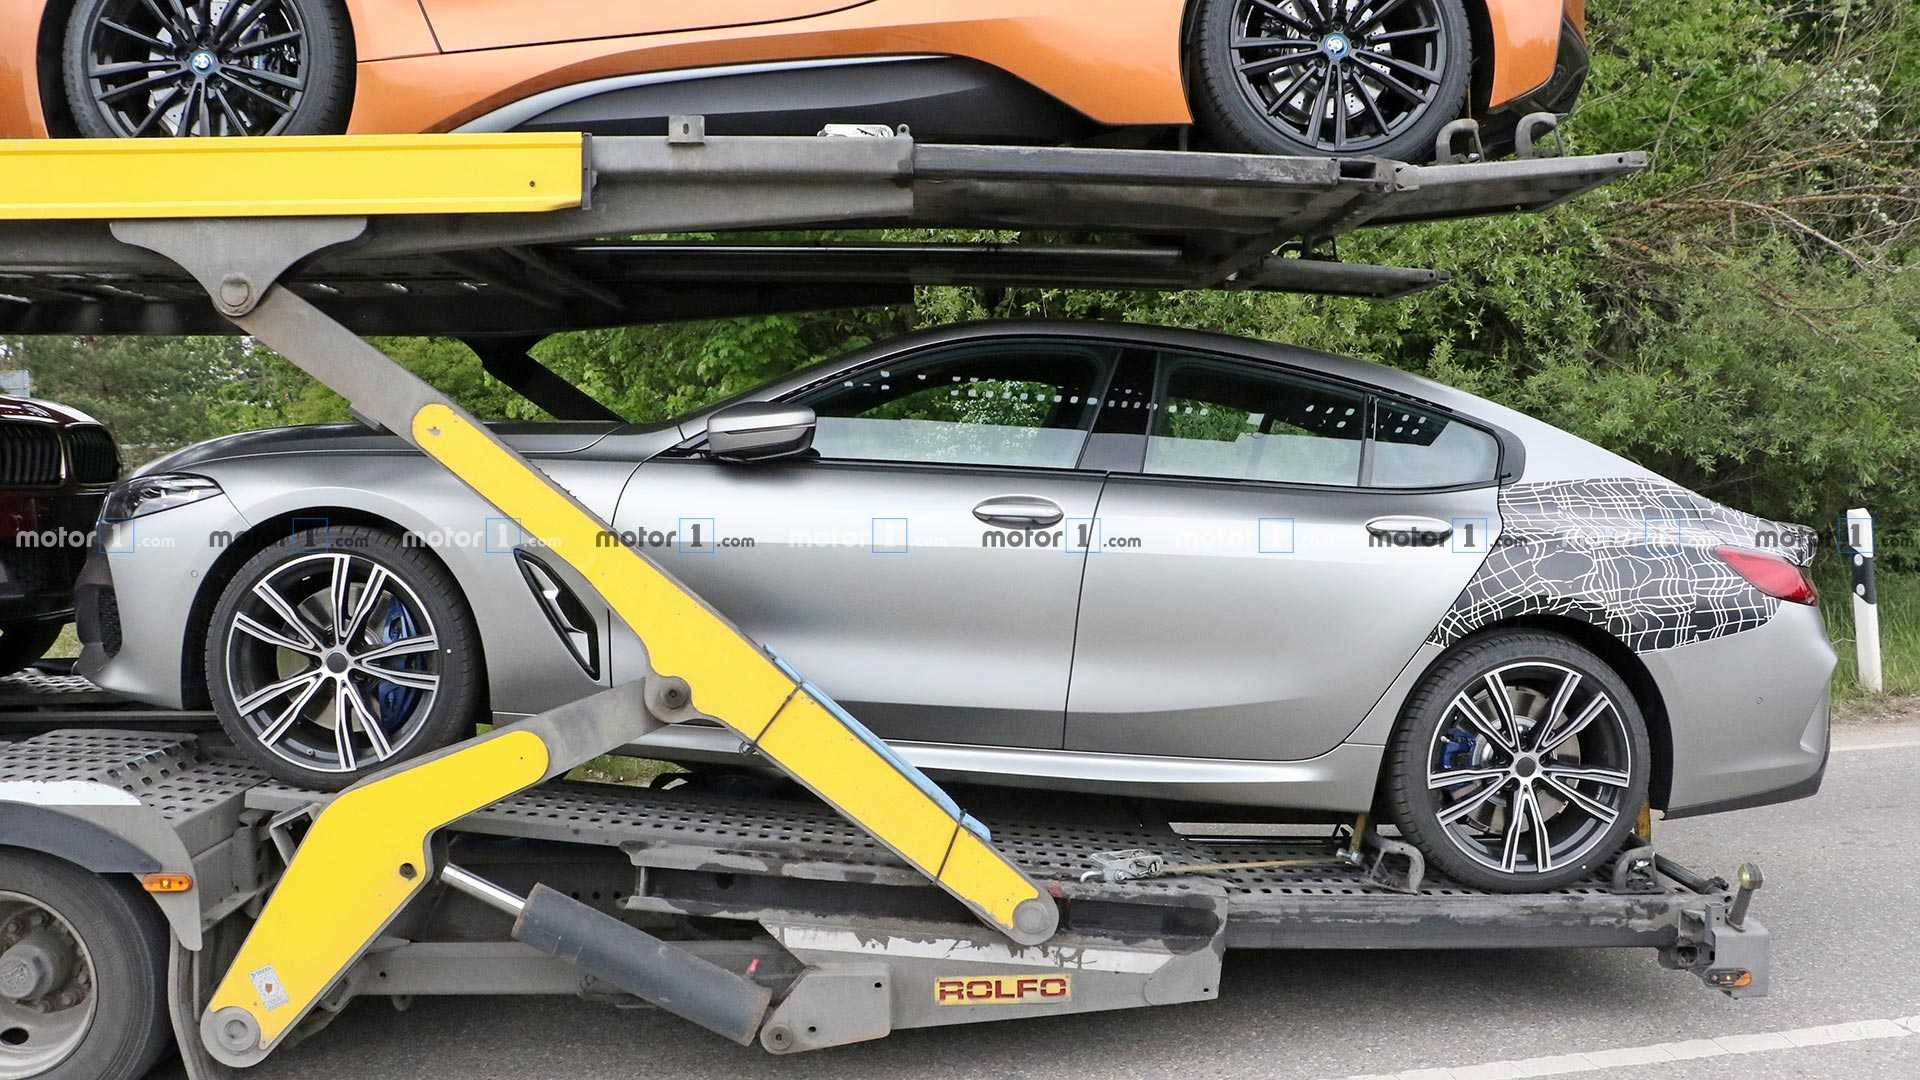 2019 - [BMW] Série 8 Gran Coupé [G16] - Page 3 Bmw-8-series-gran-coupe-spy-shots